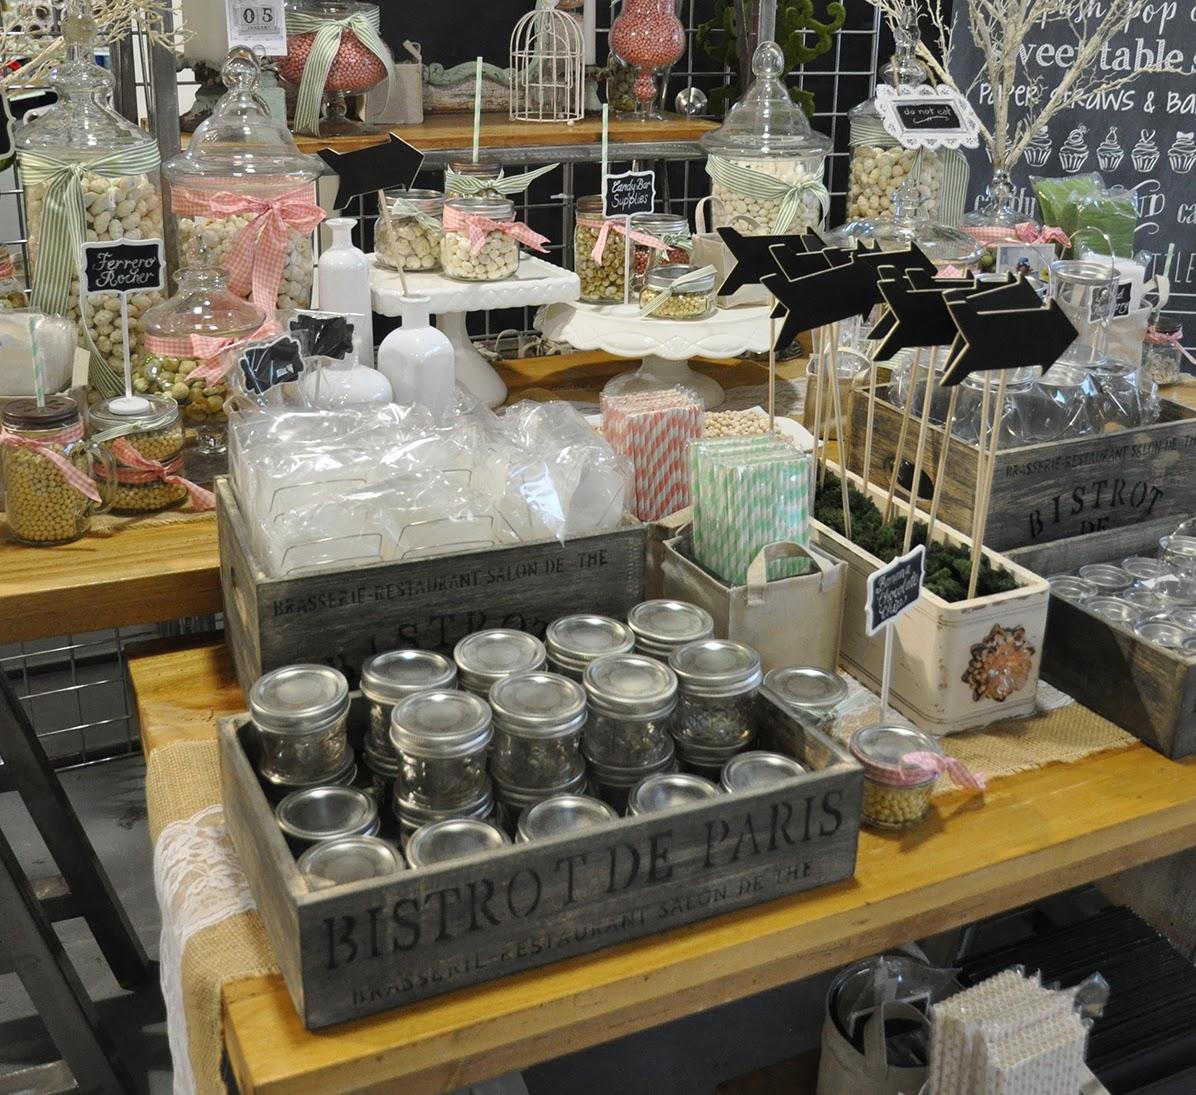 sweet table supplies from Creative Bag | creativebag.com